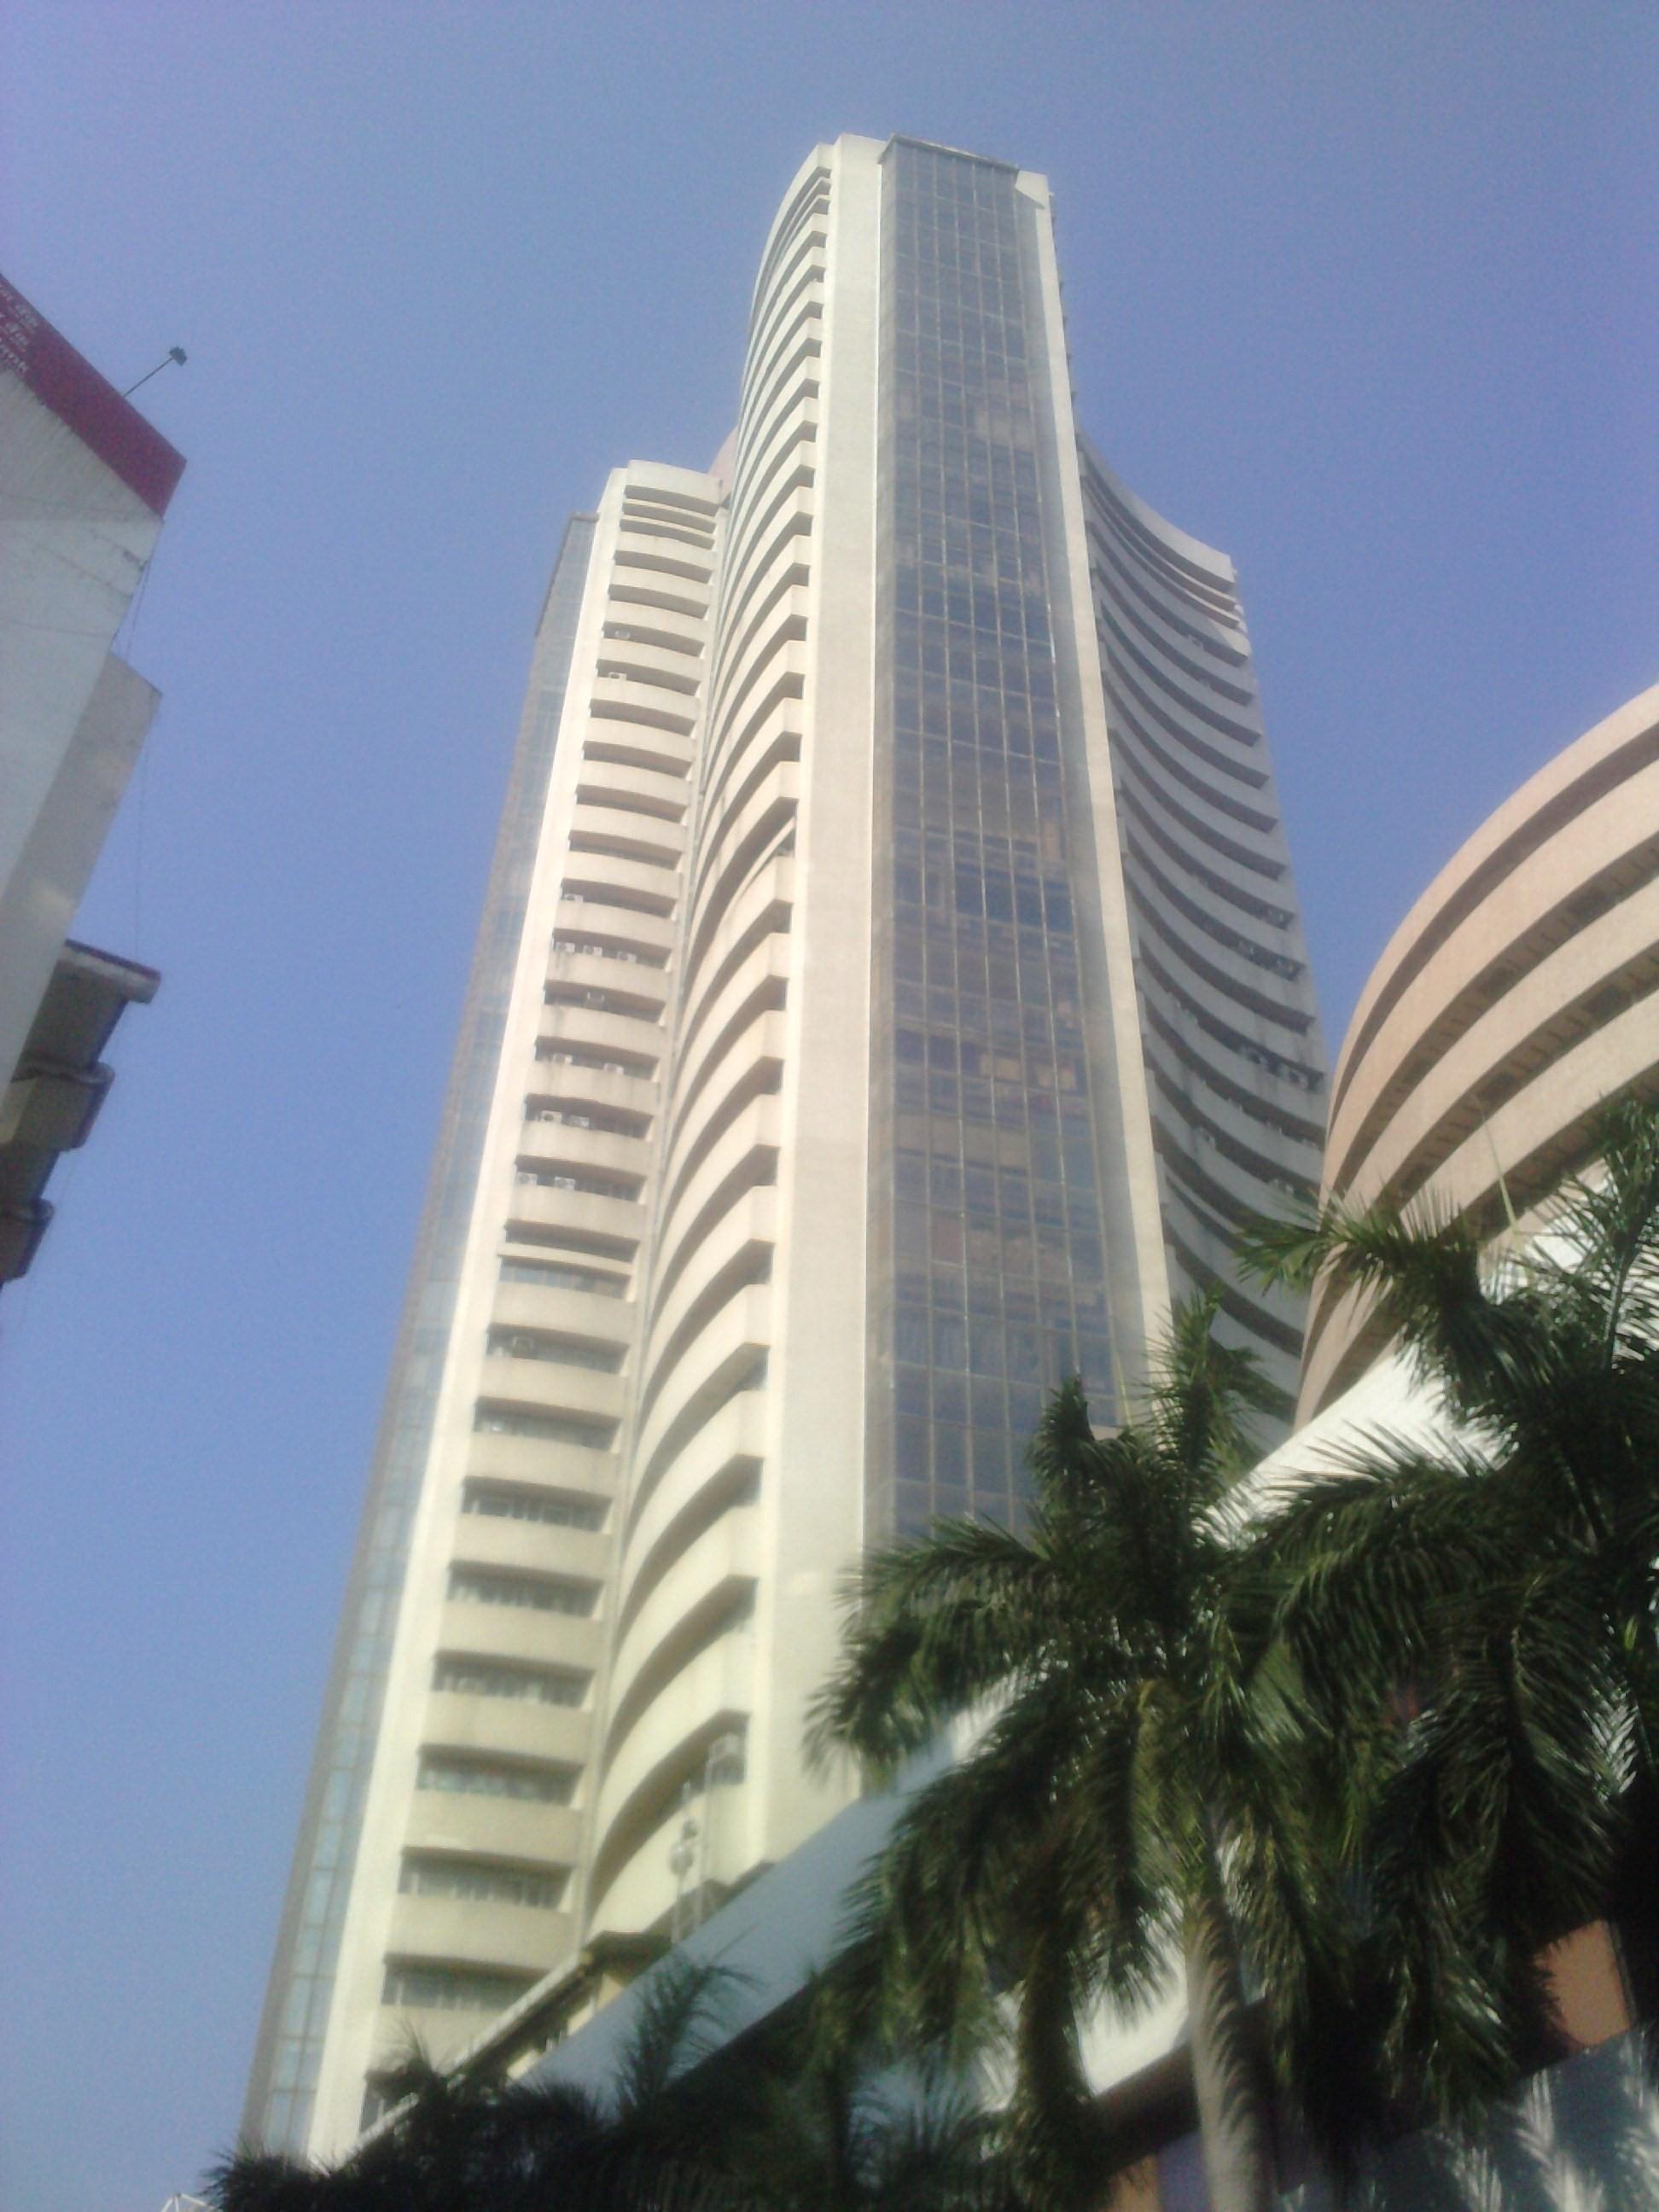 Chart For Indian Stock Market: Bombay Stock Exchange 2.jpg - Wikimedia Commons,Chart